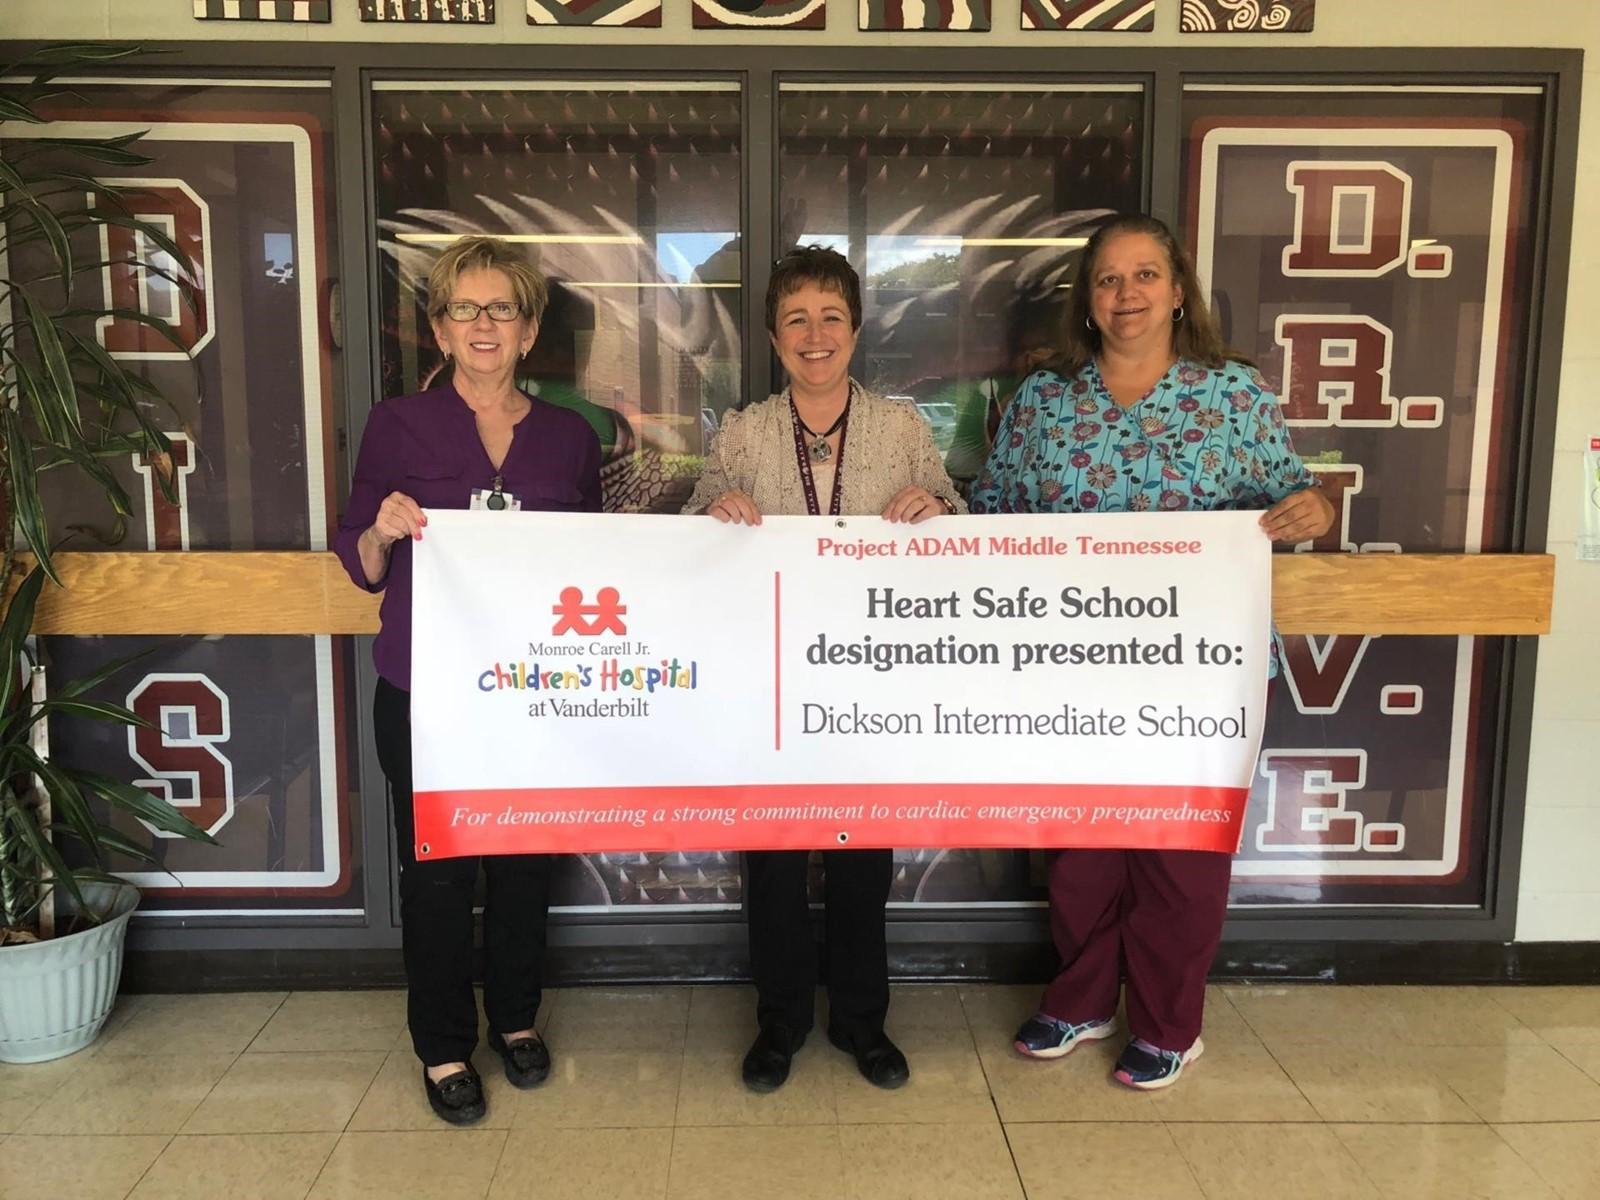 Heart Safe School